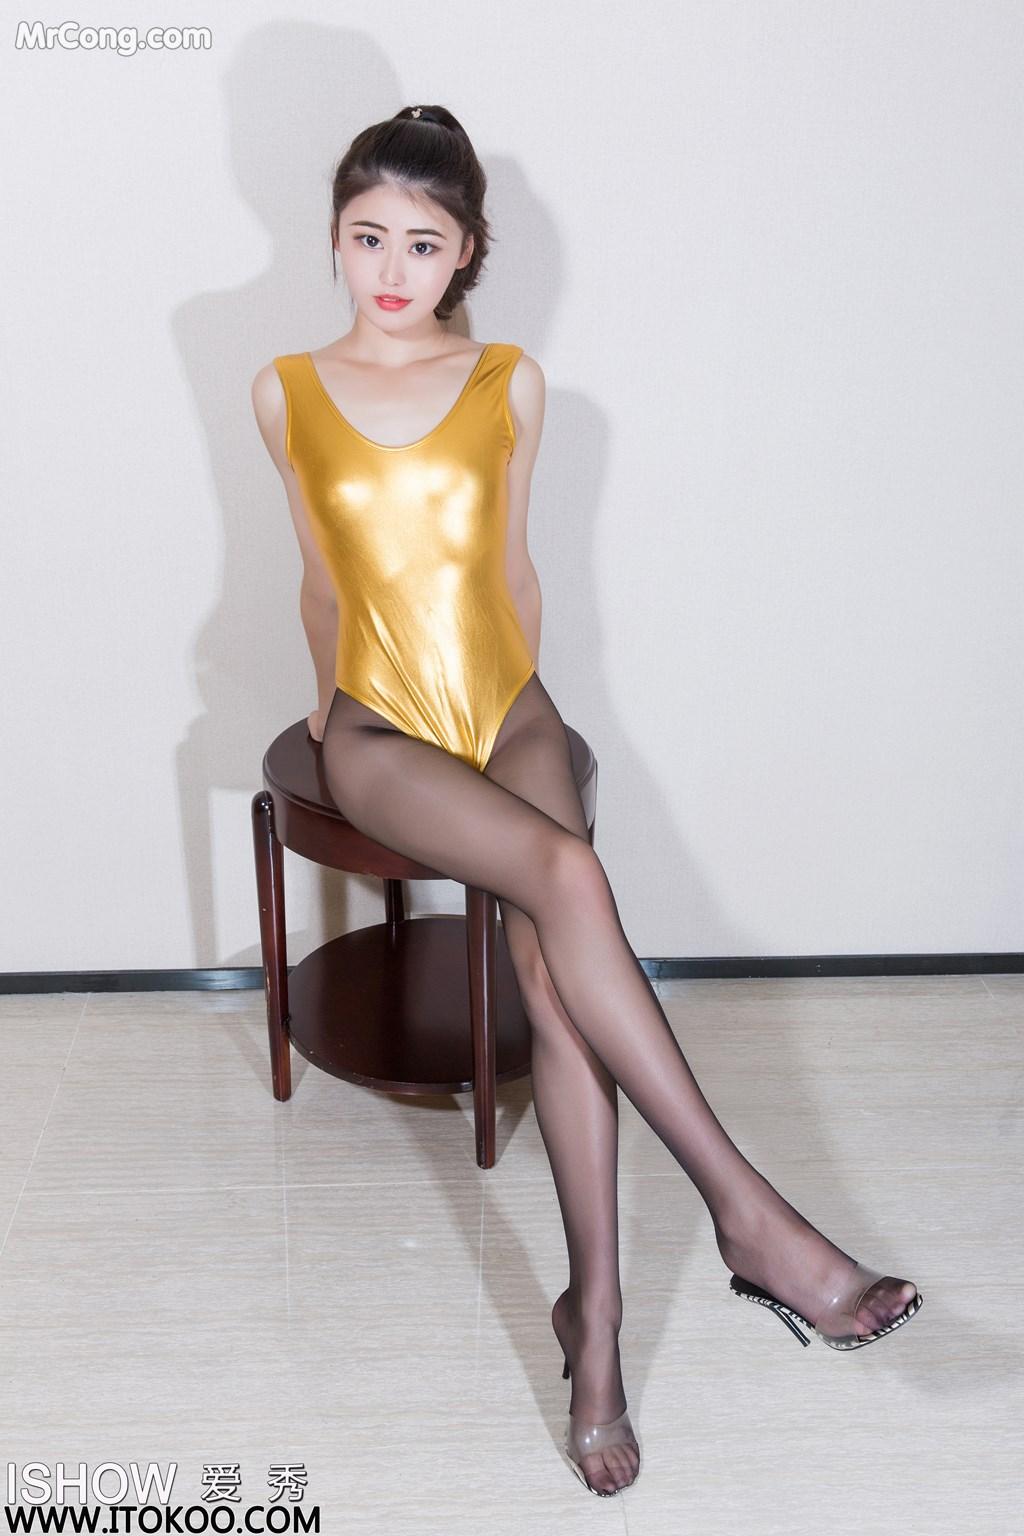 Image ISHOW-No.169-Liu-Yue-Fei-Phoebe-MrCong.com-007 in post ISHOW No.169: Người mẫu Liu Yue Fei (刘玥菲Phoebe) (31 ảnh)